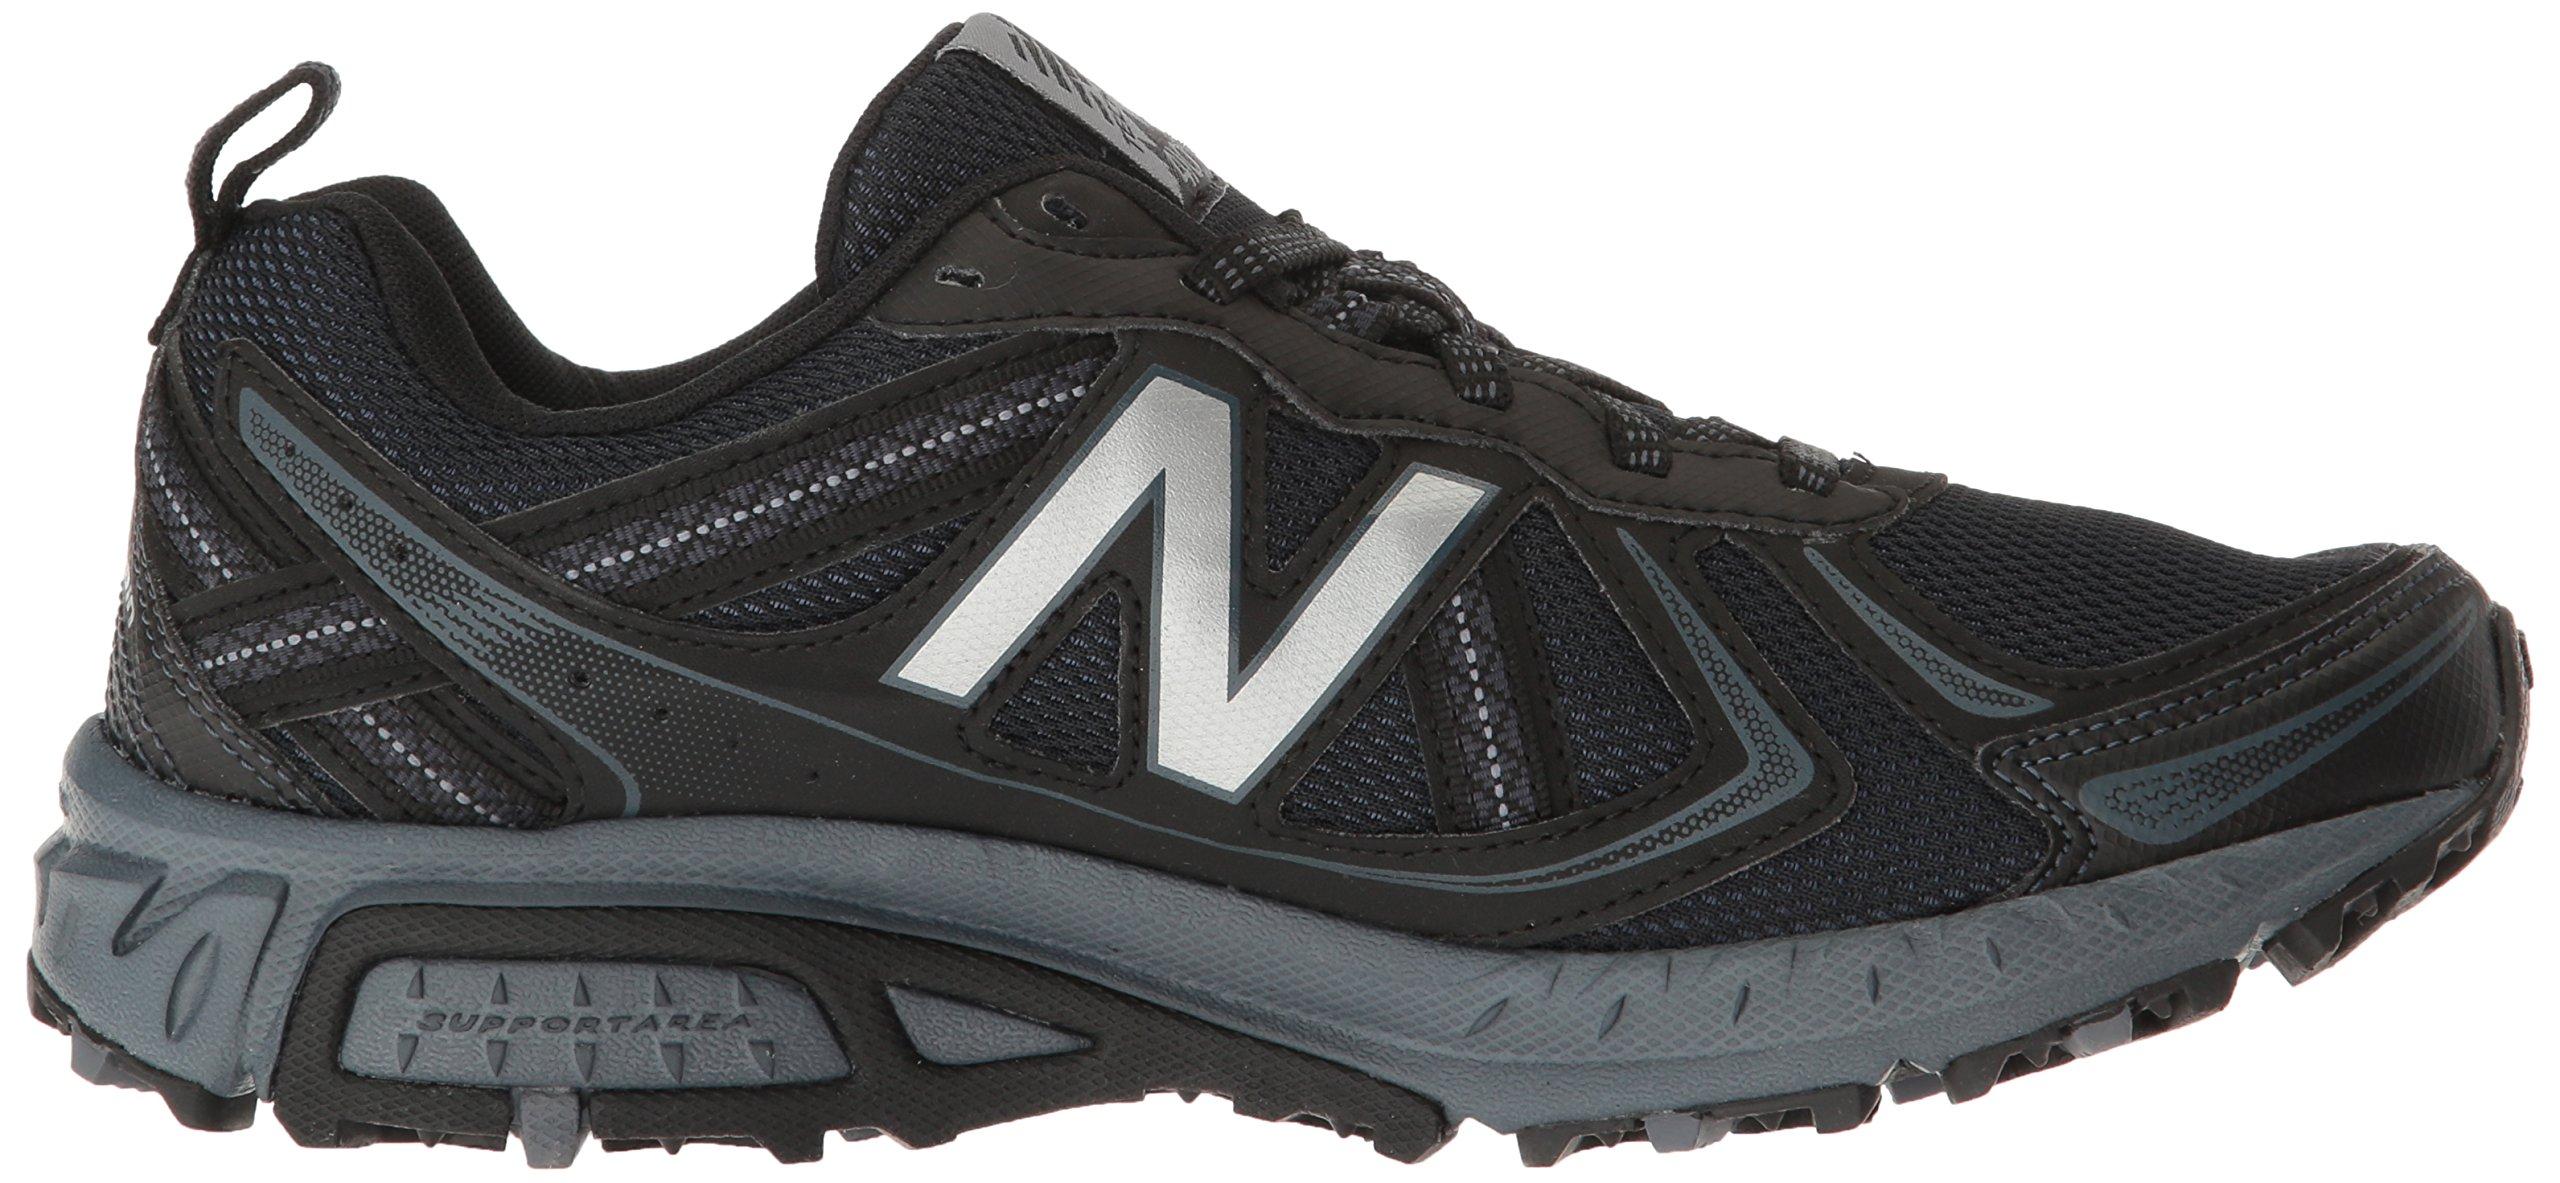 New Balance Men's MT410v5 Cushioning Trail Running Shoe, Black, 7 D US by New Balance (Image #7)